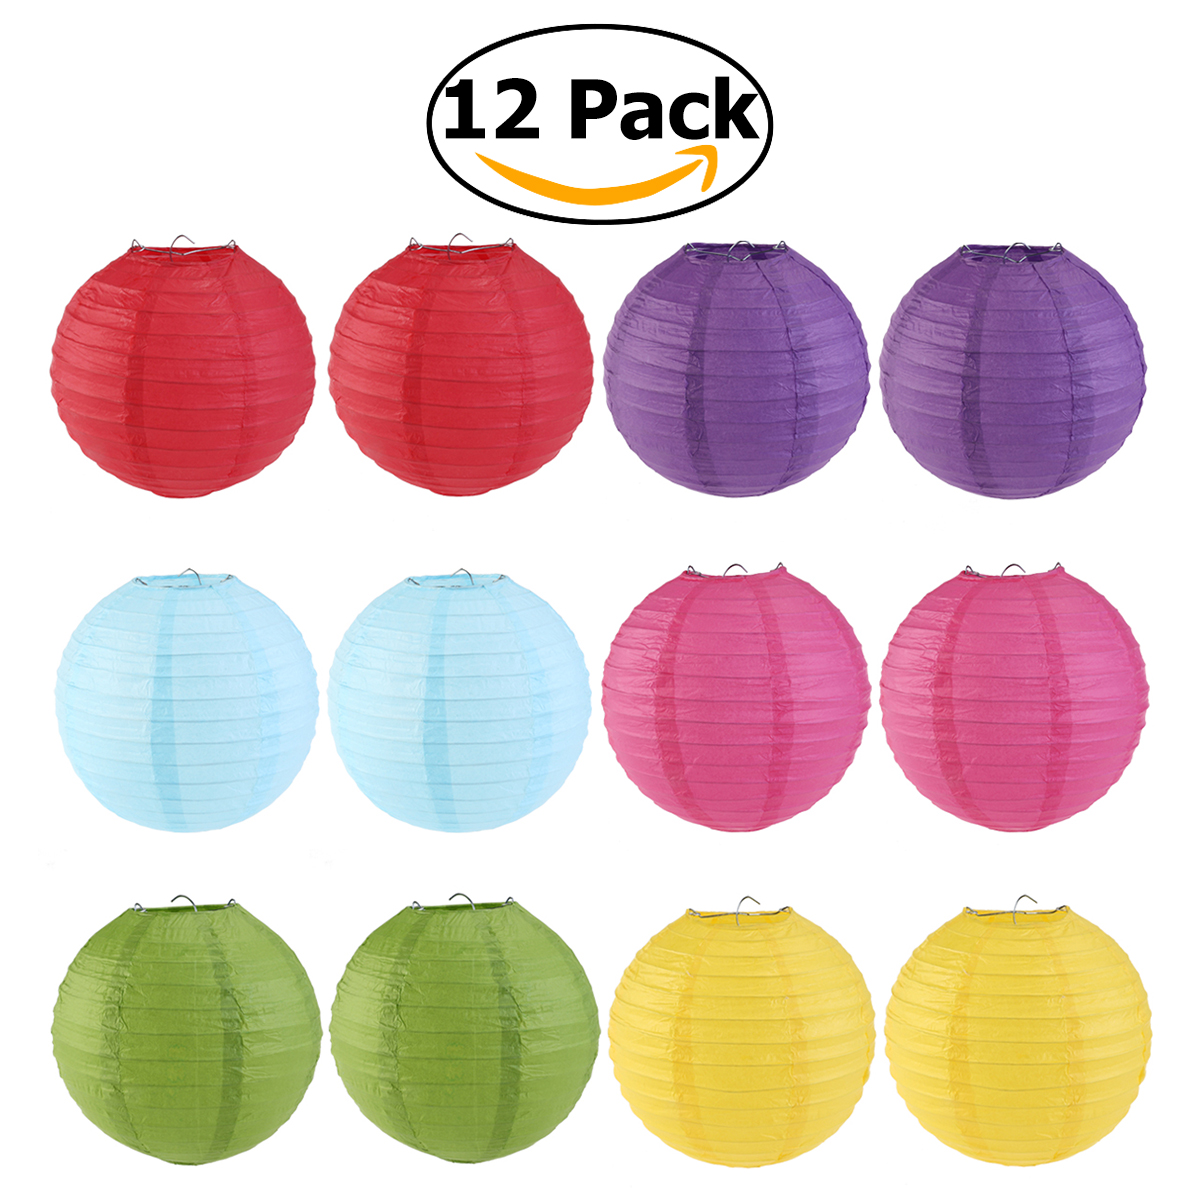 WINOMO 12pcs 6 Colors 25cm Round Paper Lanterns with Wire Ribbing (Red+Light Green+Rose Red+Sky Blue+Dark Purple+Yellow)(China (Mainland))